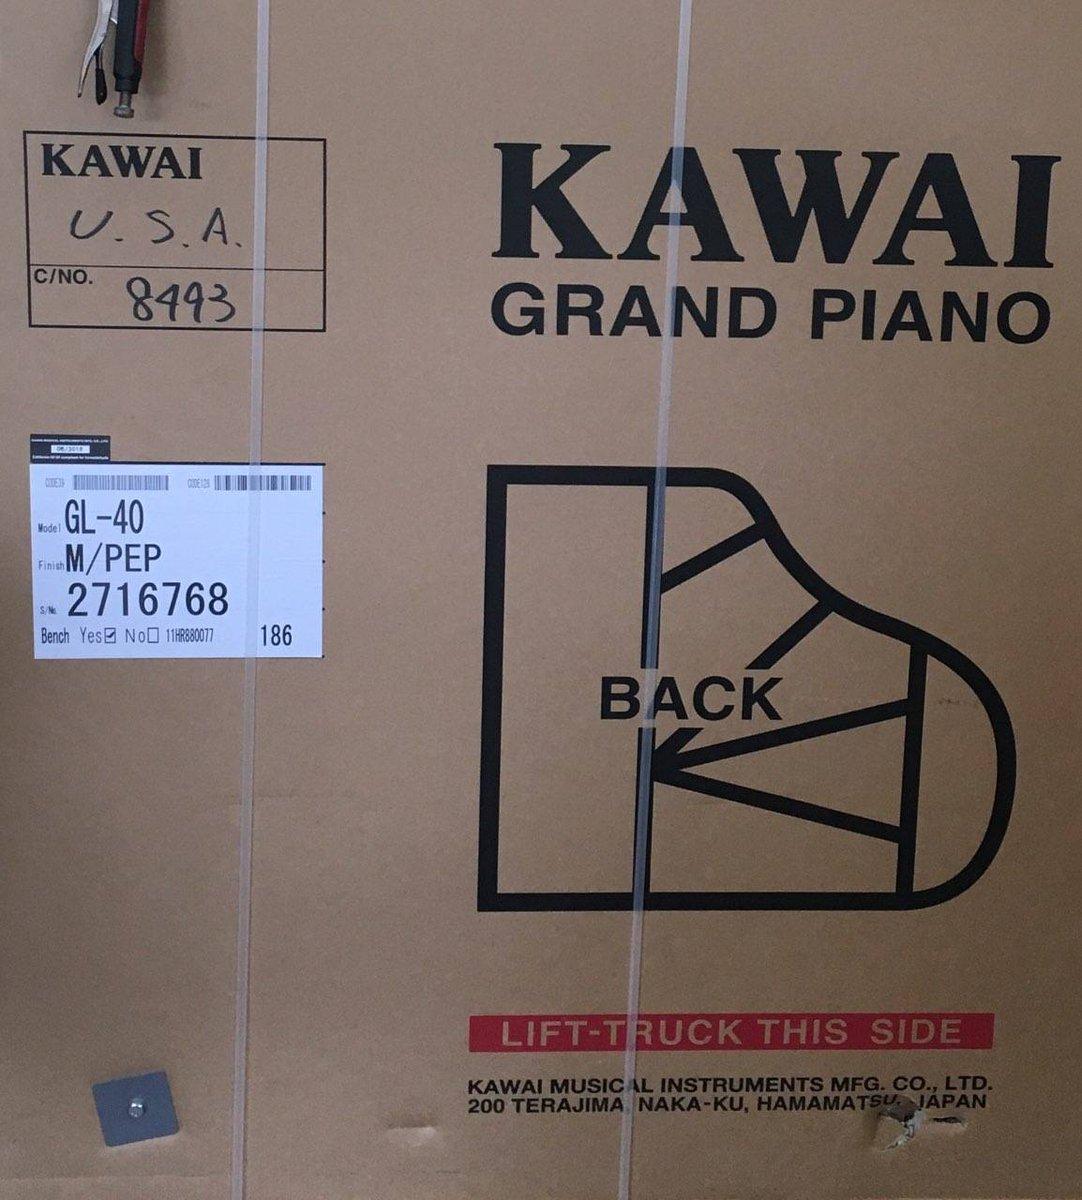 Maus Piano & Organ (@Mauspiano) | Twitter